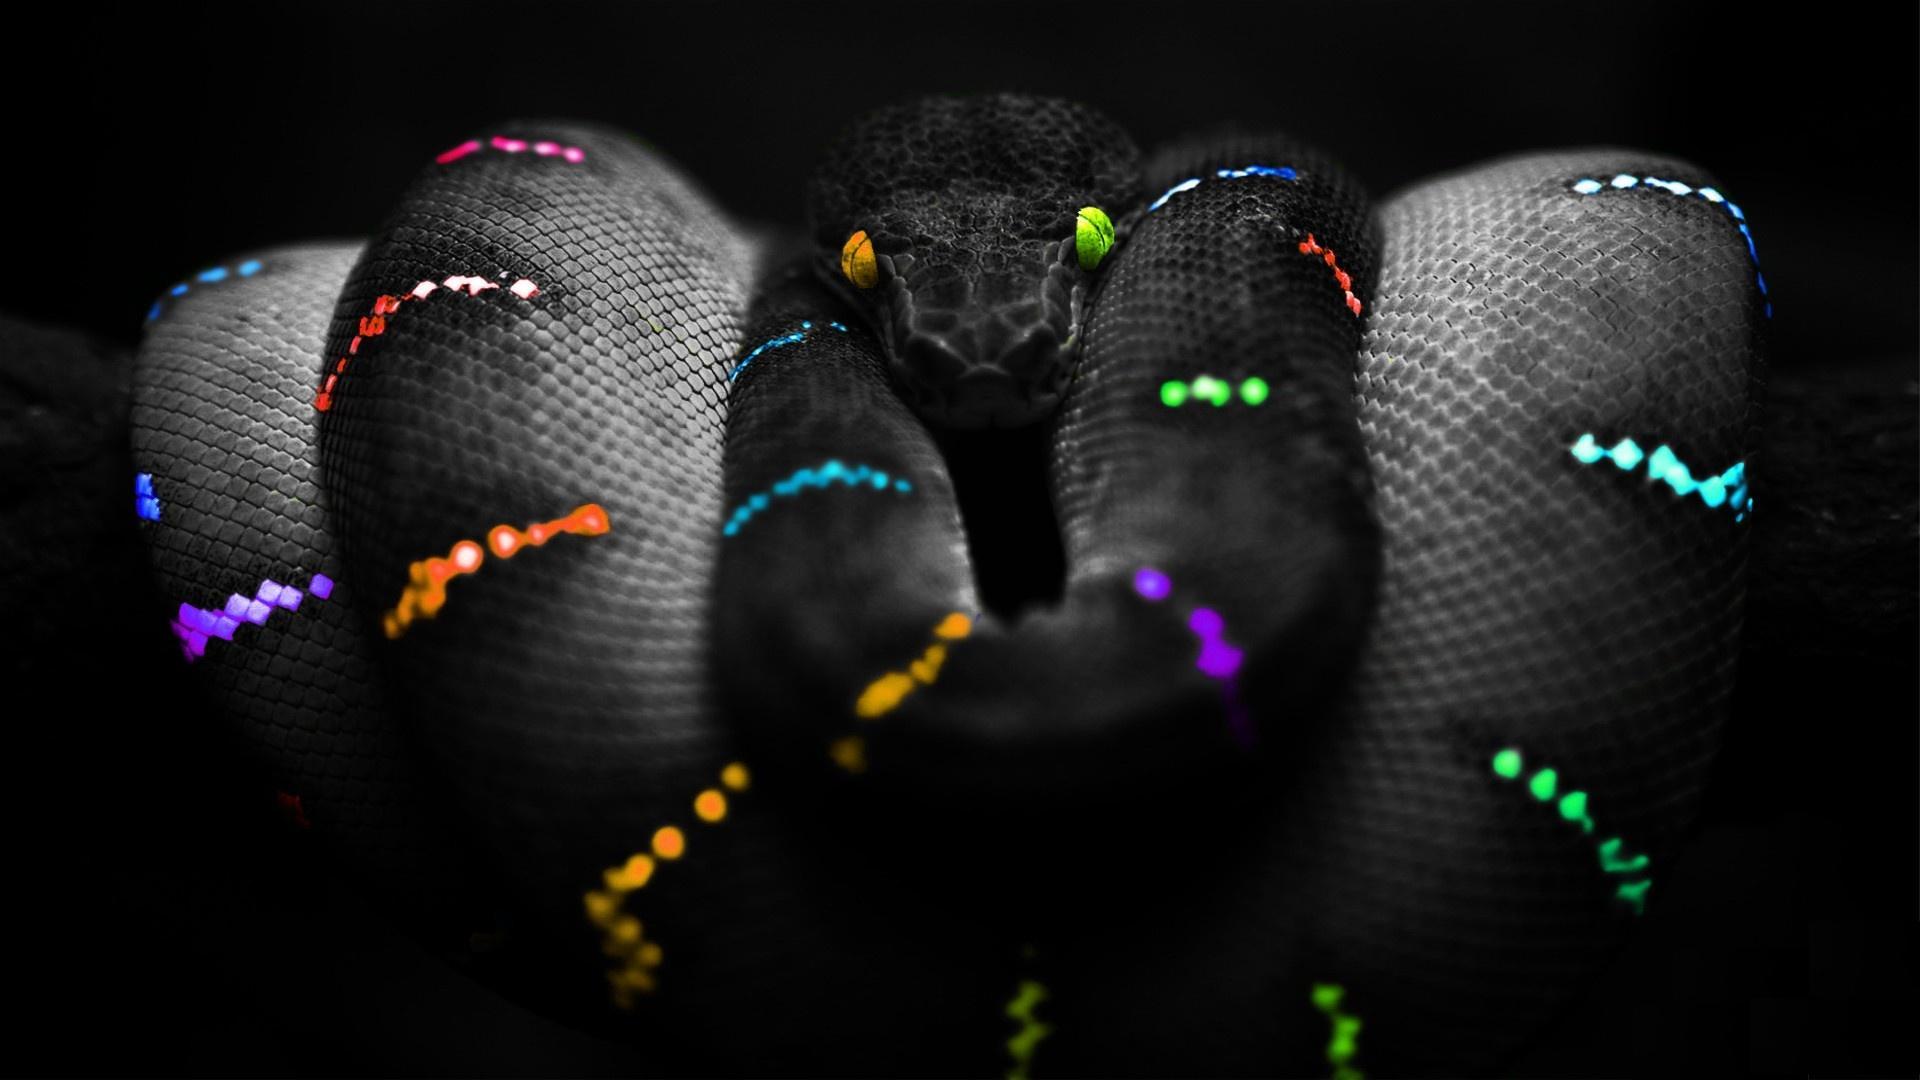 Hd Wallpaper Of Black Snake: Achtergronden - Wallpaper Abyss